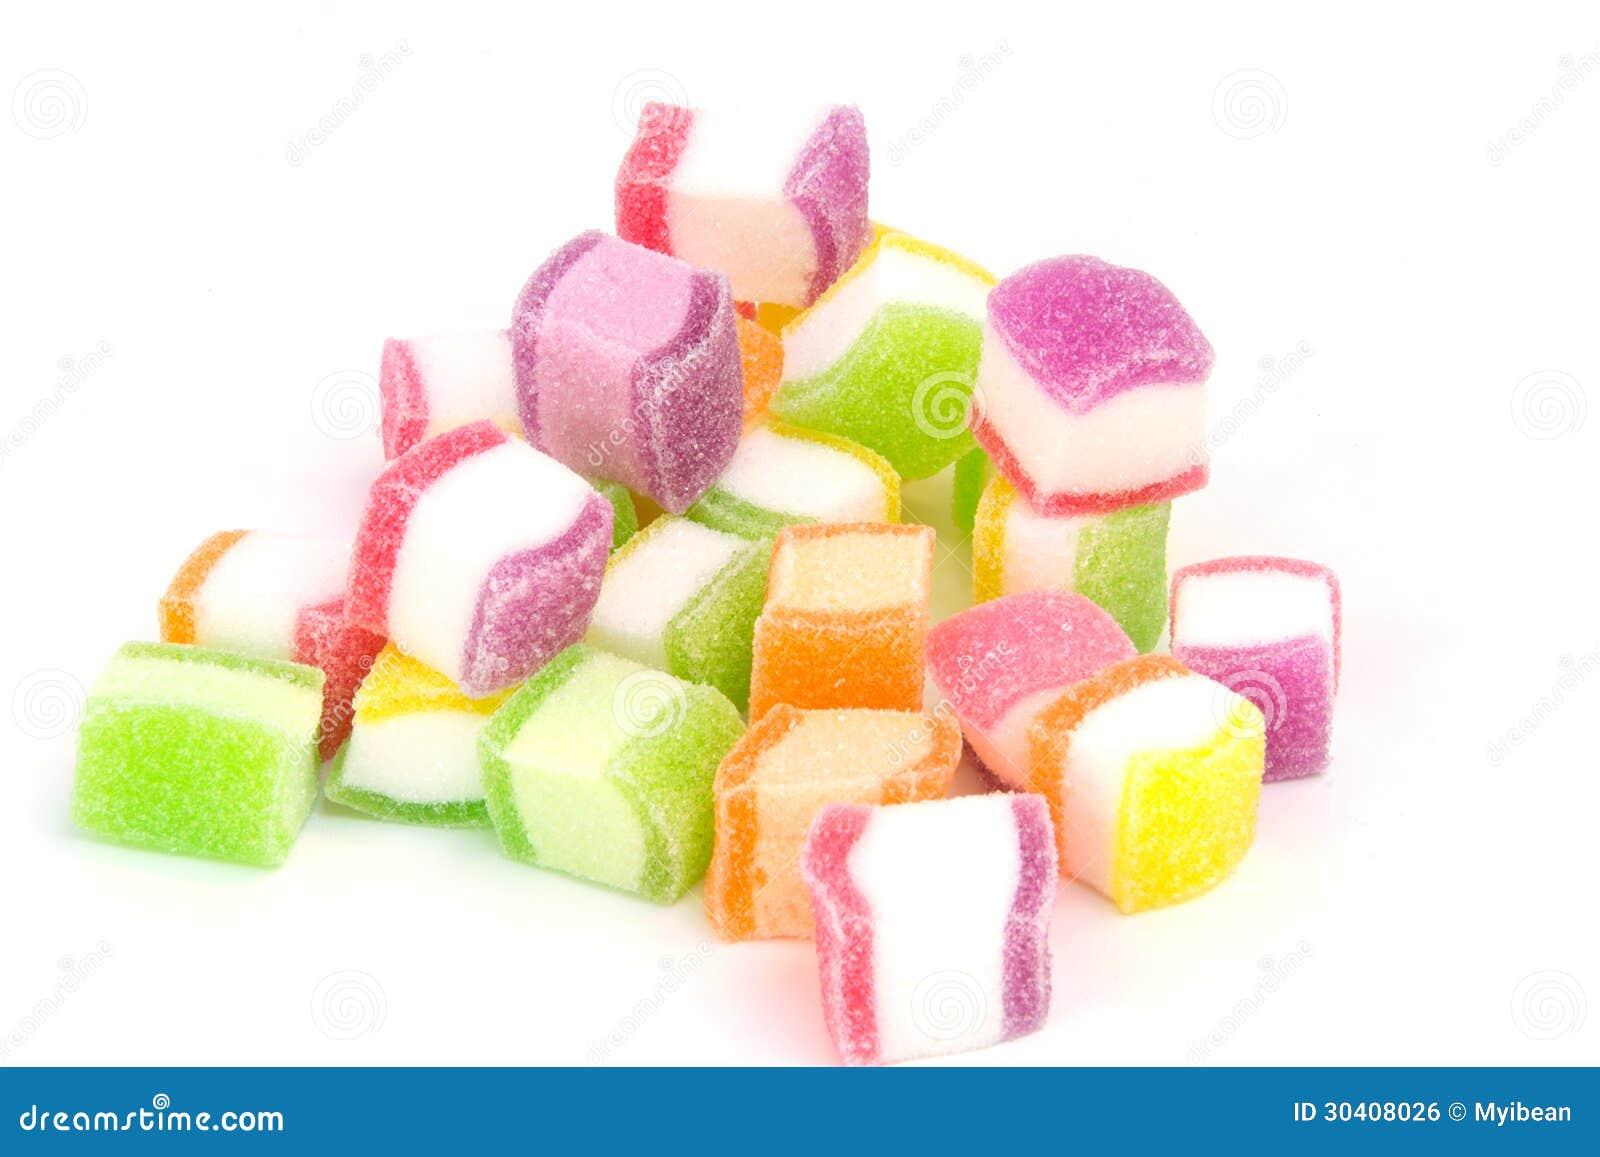 Candy, marshmallow with gelatin dessert